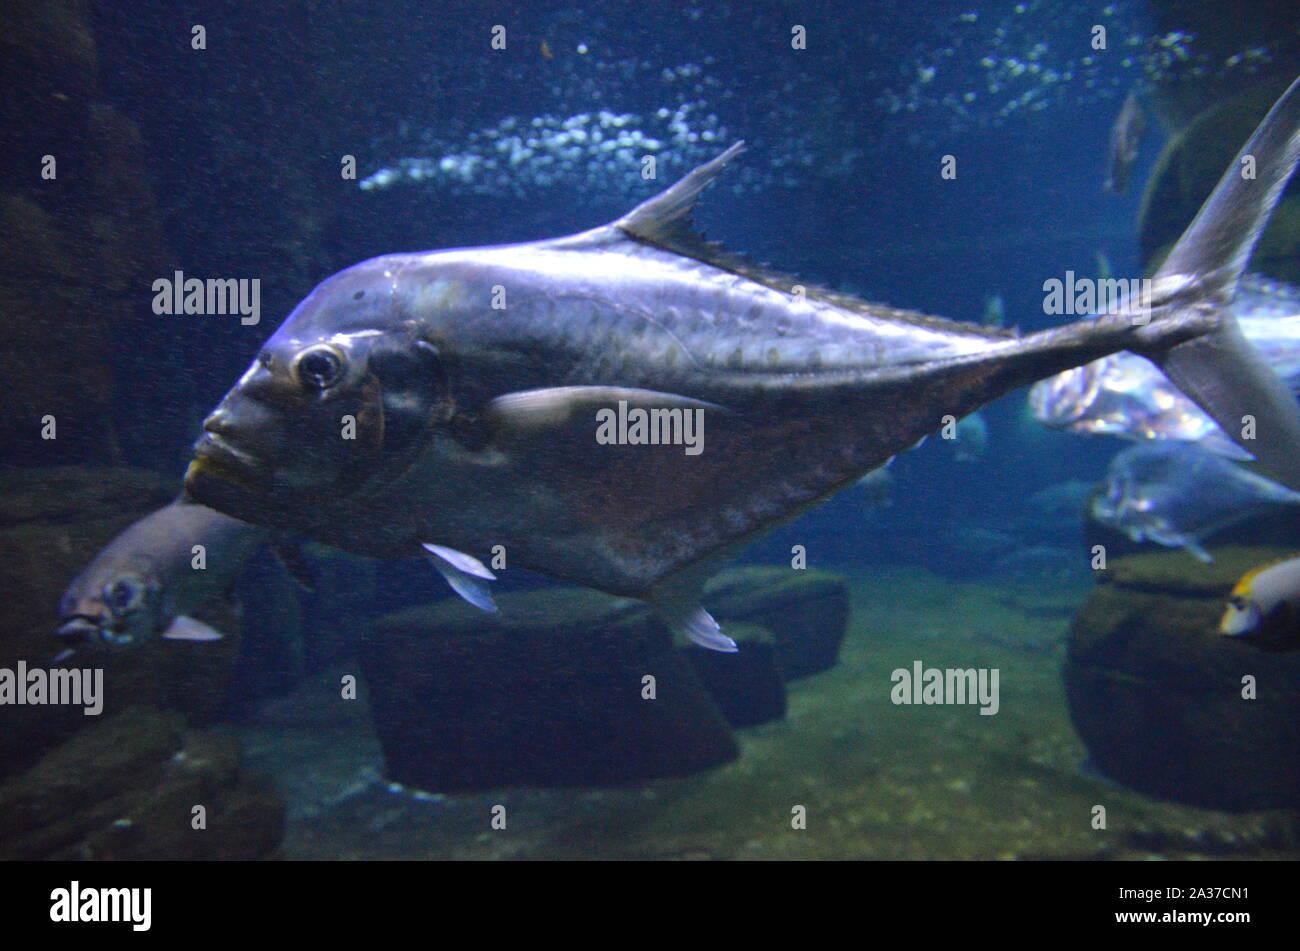 Lockdown fish Selene dorsalis Atlantic, aquarium Berlin Germany Stock Photo